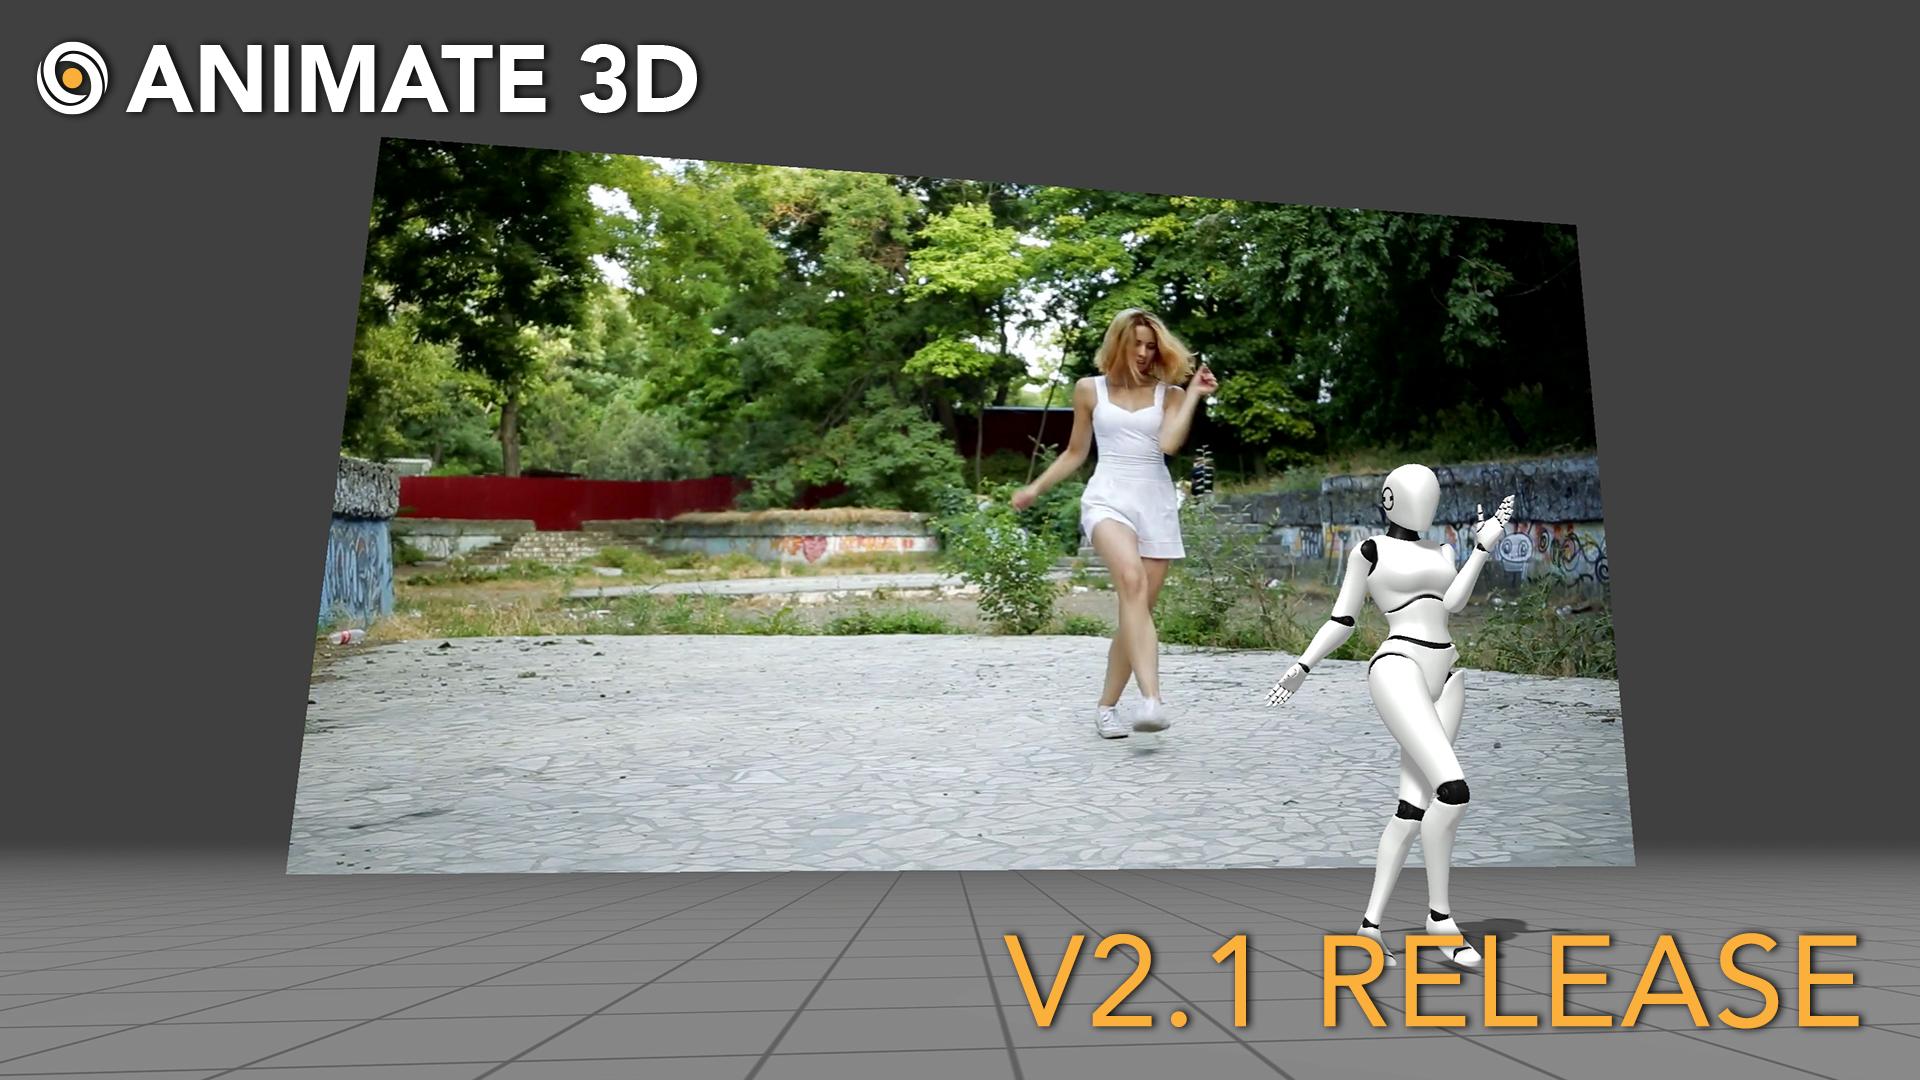 Animate 3D - V 2.1 Release